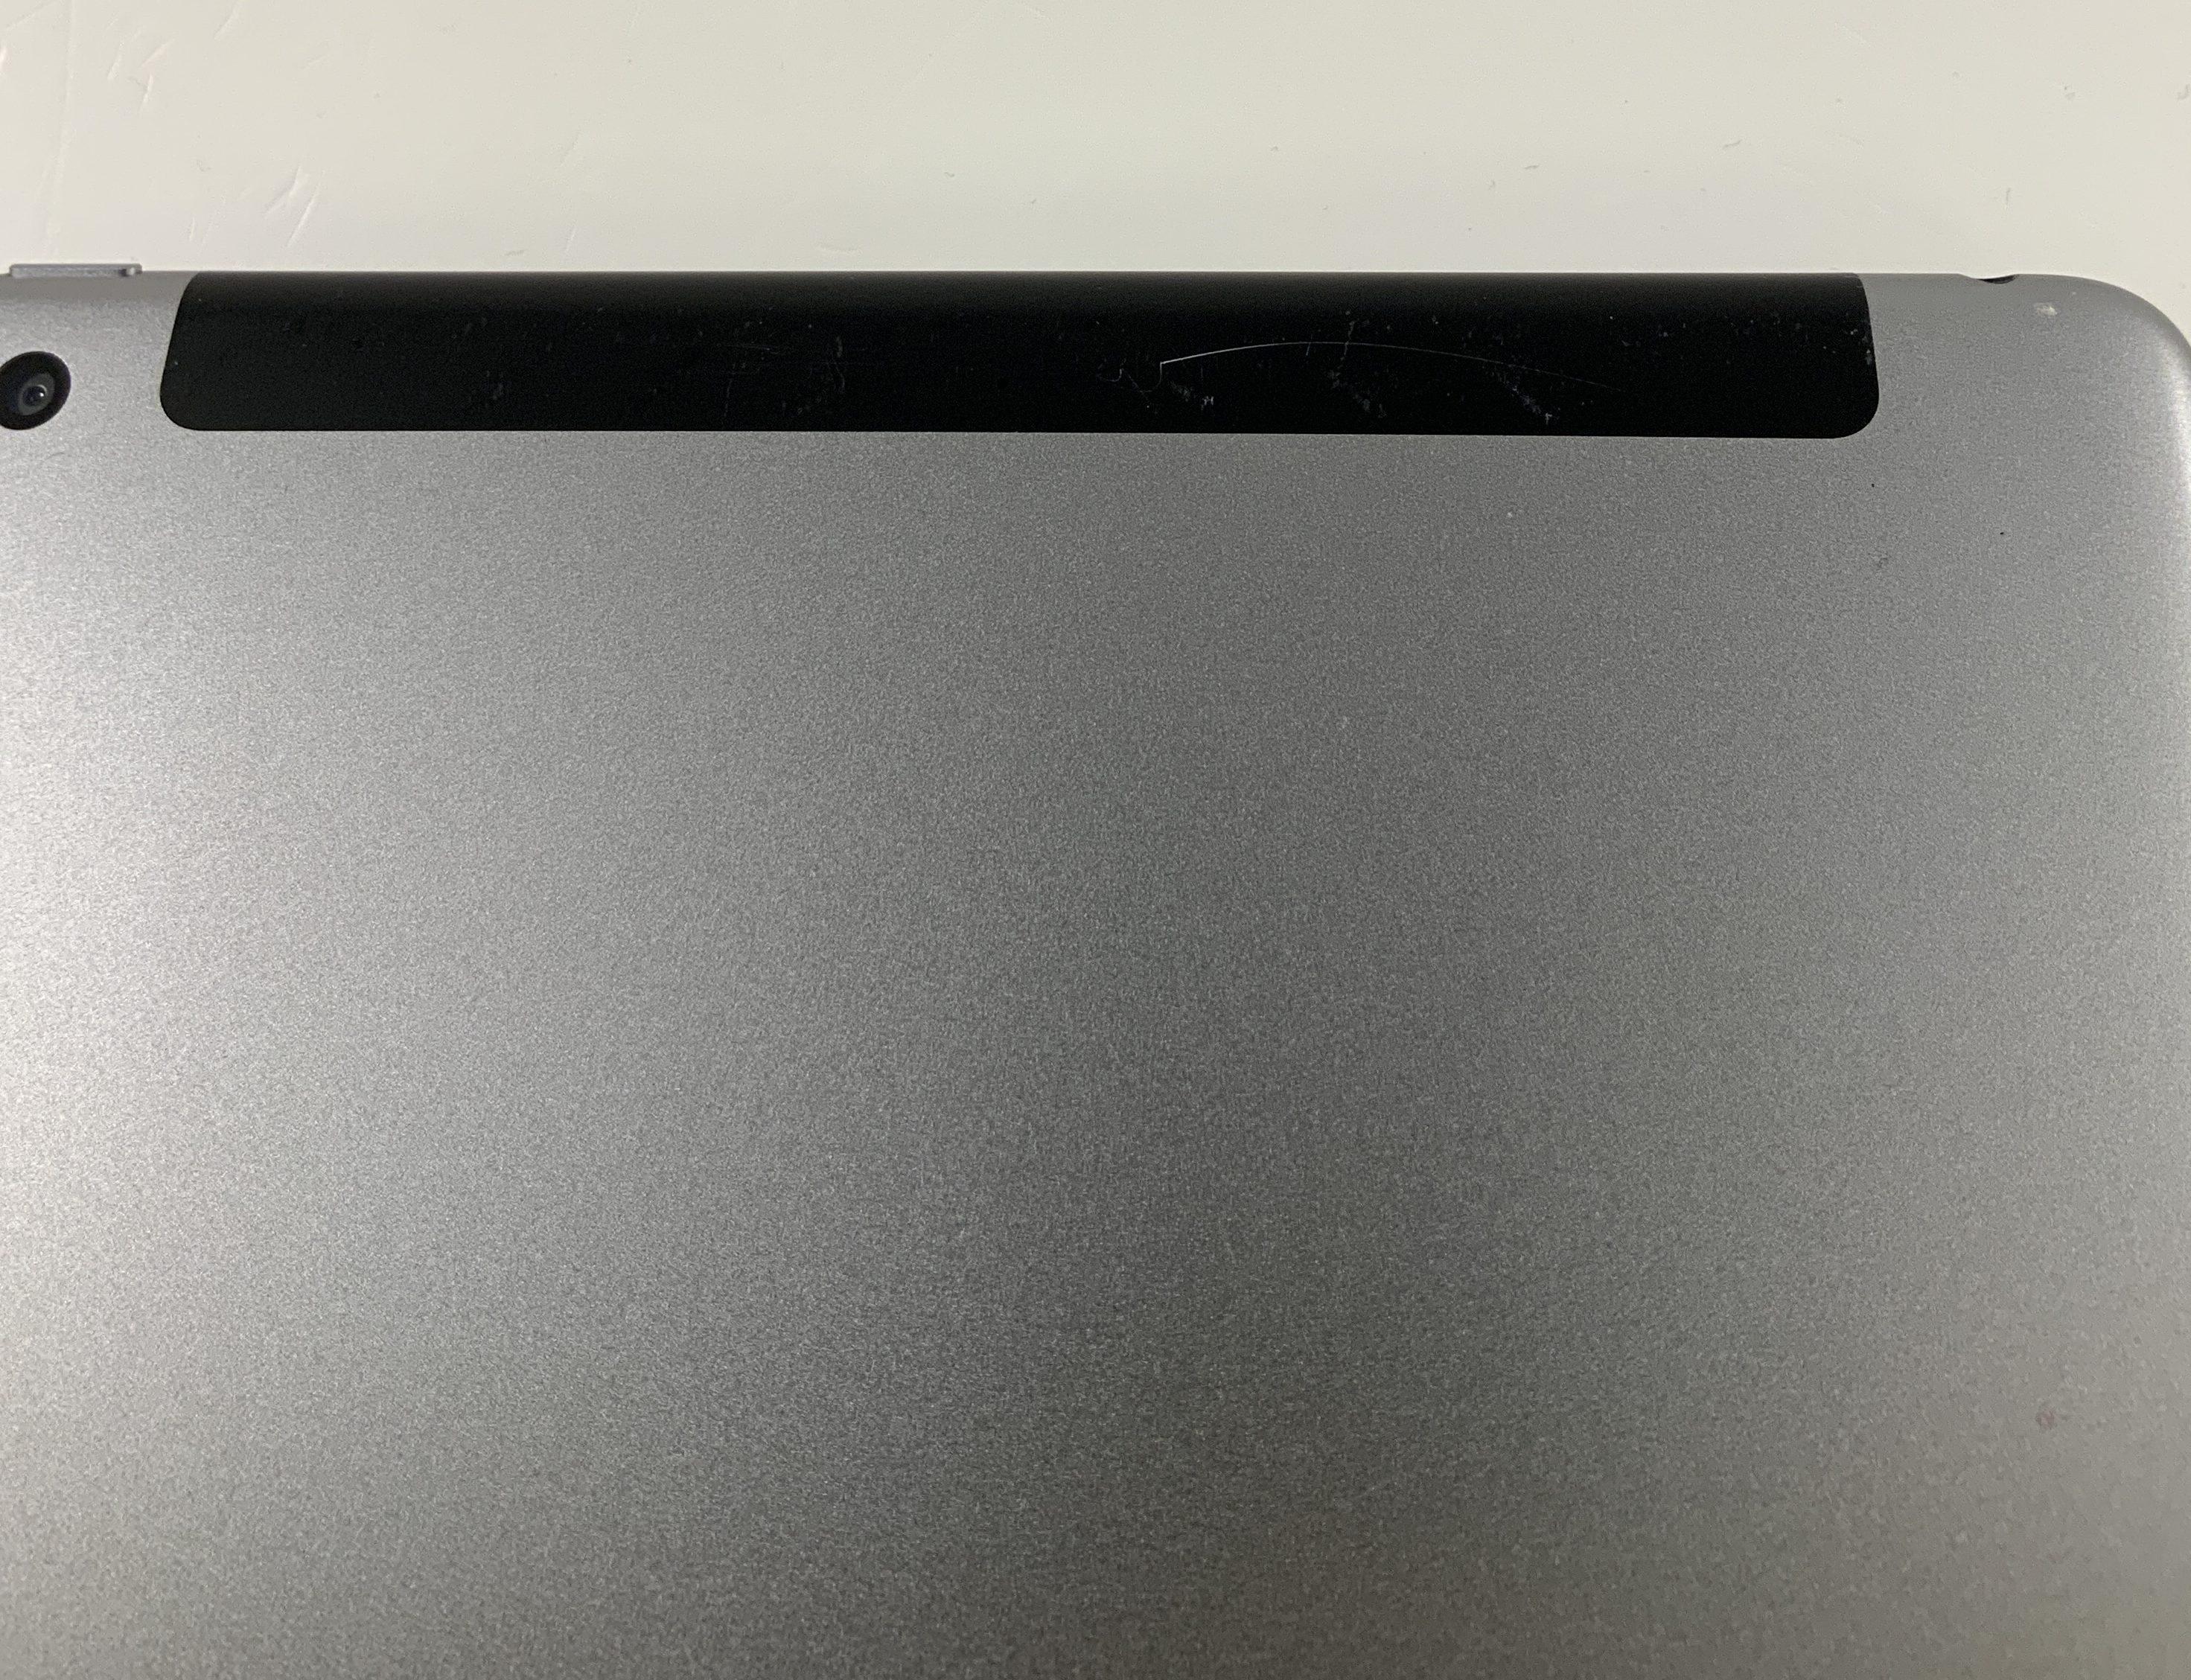 iPad 5 Wi-Fi + Cellular 128GB, 128GB, Space Gray, Kuva 4